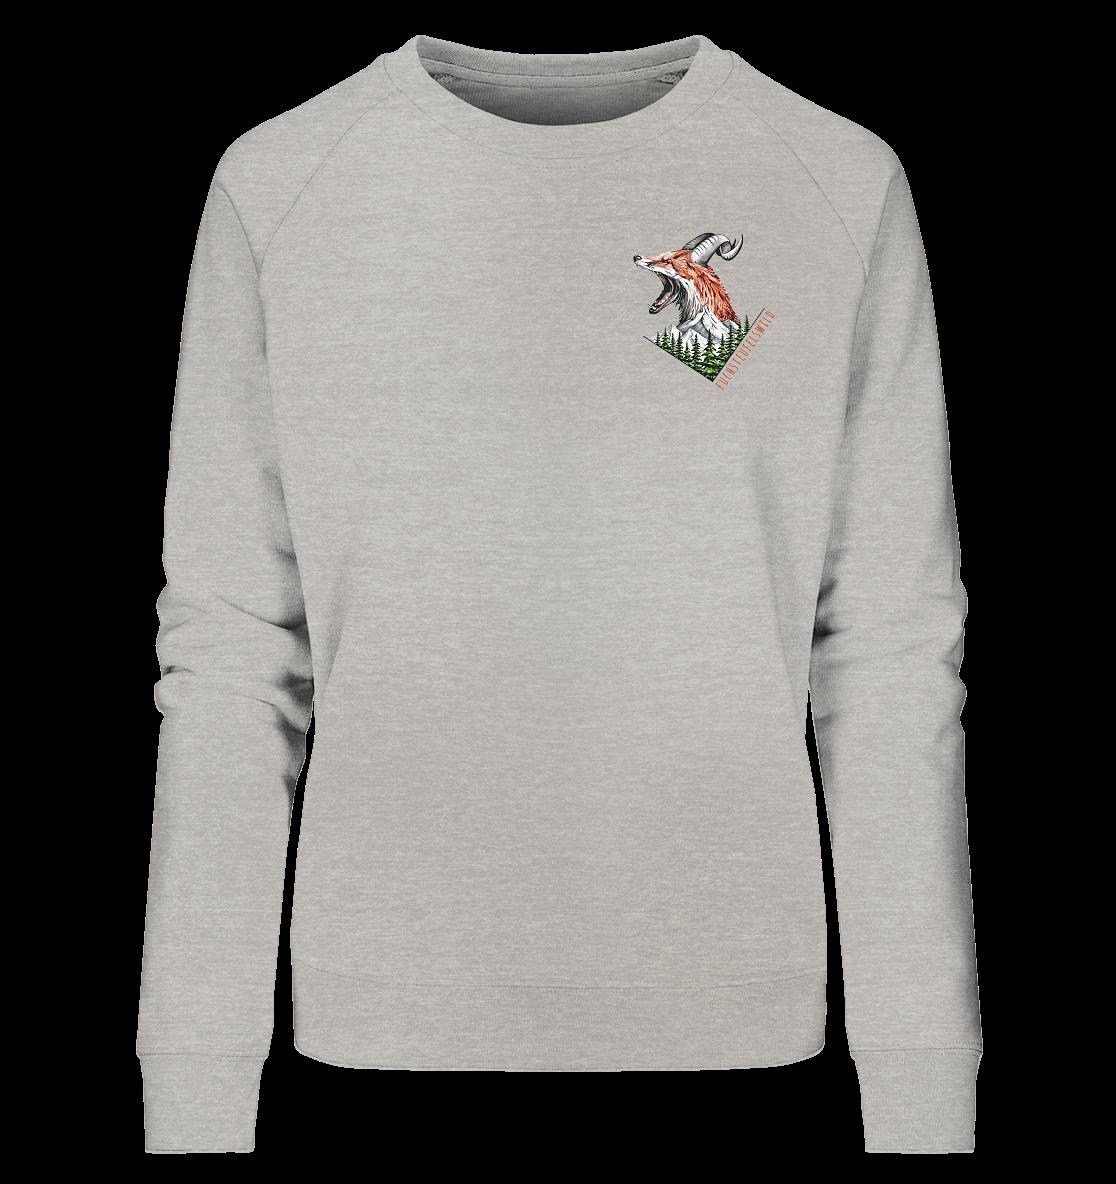 front-ladies-organic-sweatshirt-c2c1c0-1116x-2.png